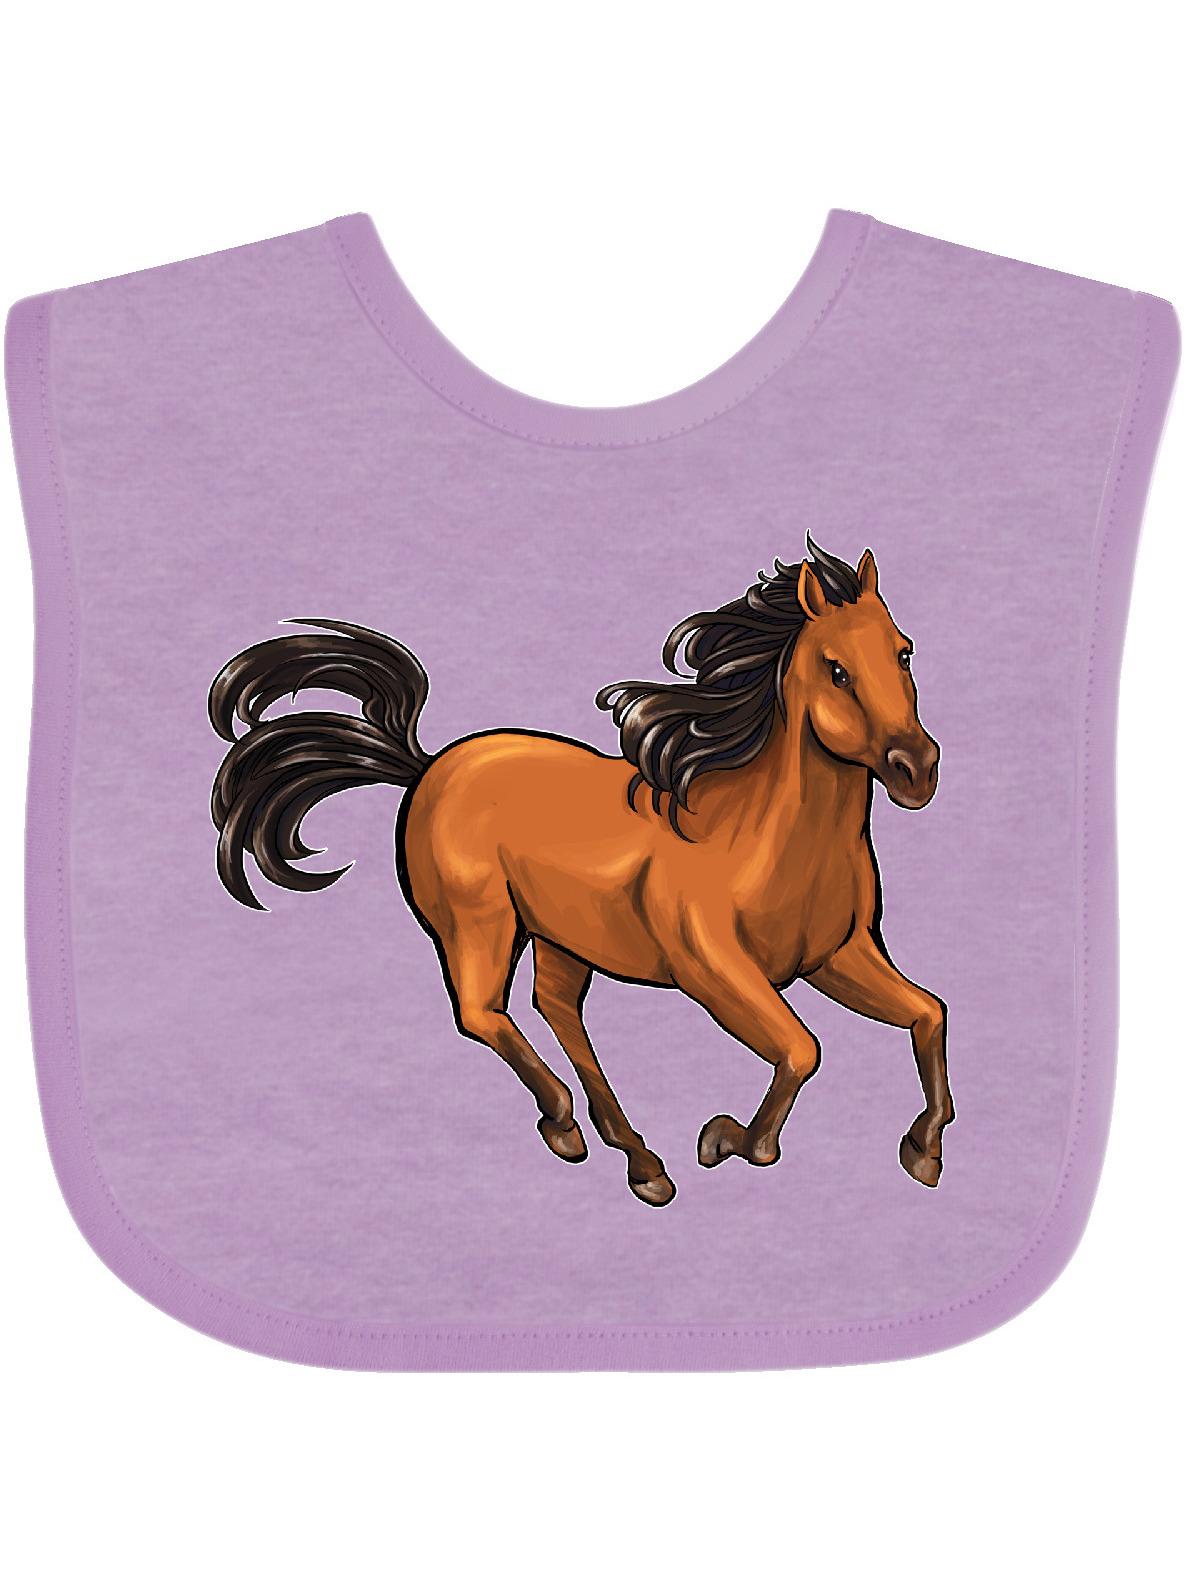 Wild Mustang Horse Galloping Baby Bib Walmart Com Walmart Com